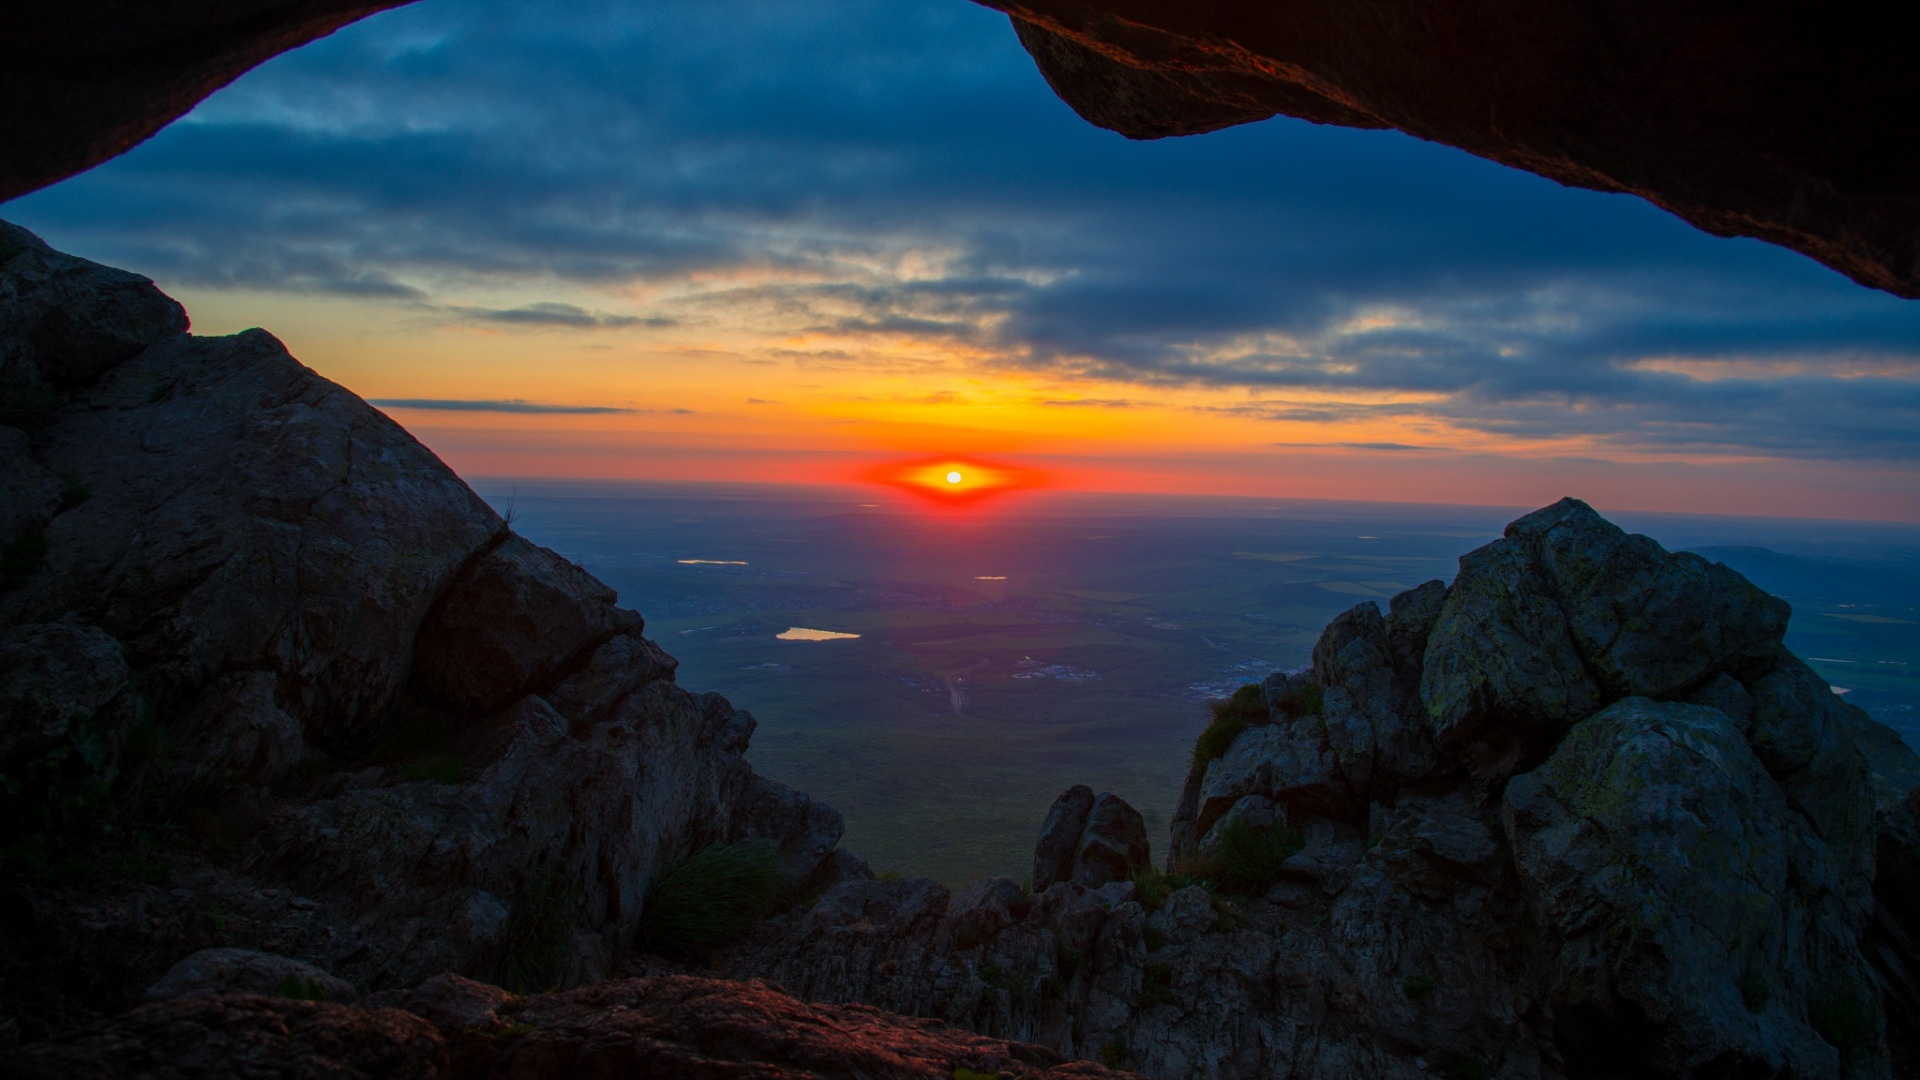 Sunset best background